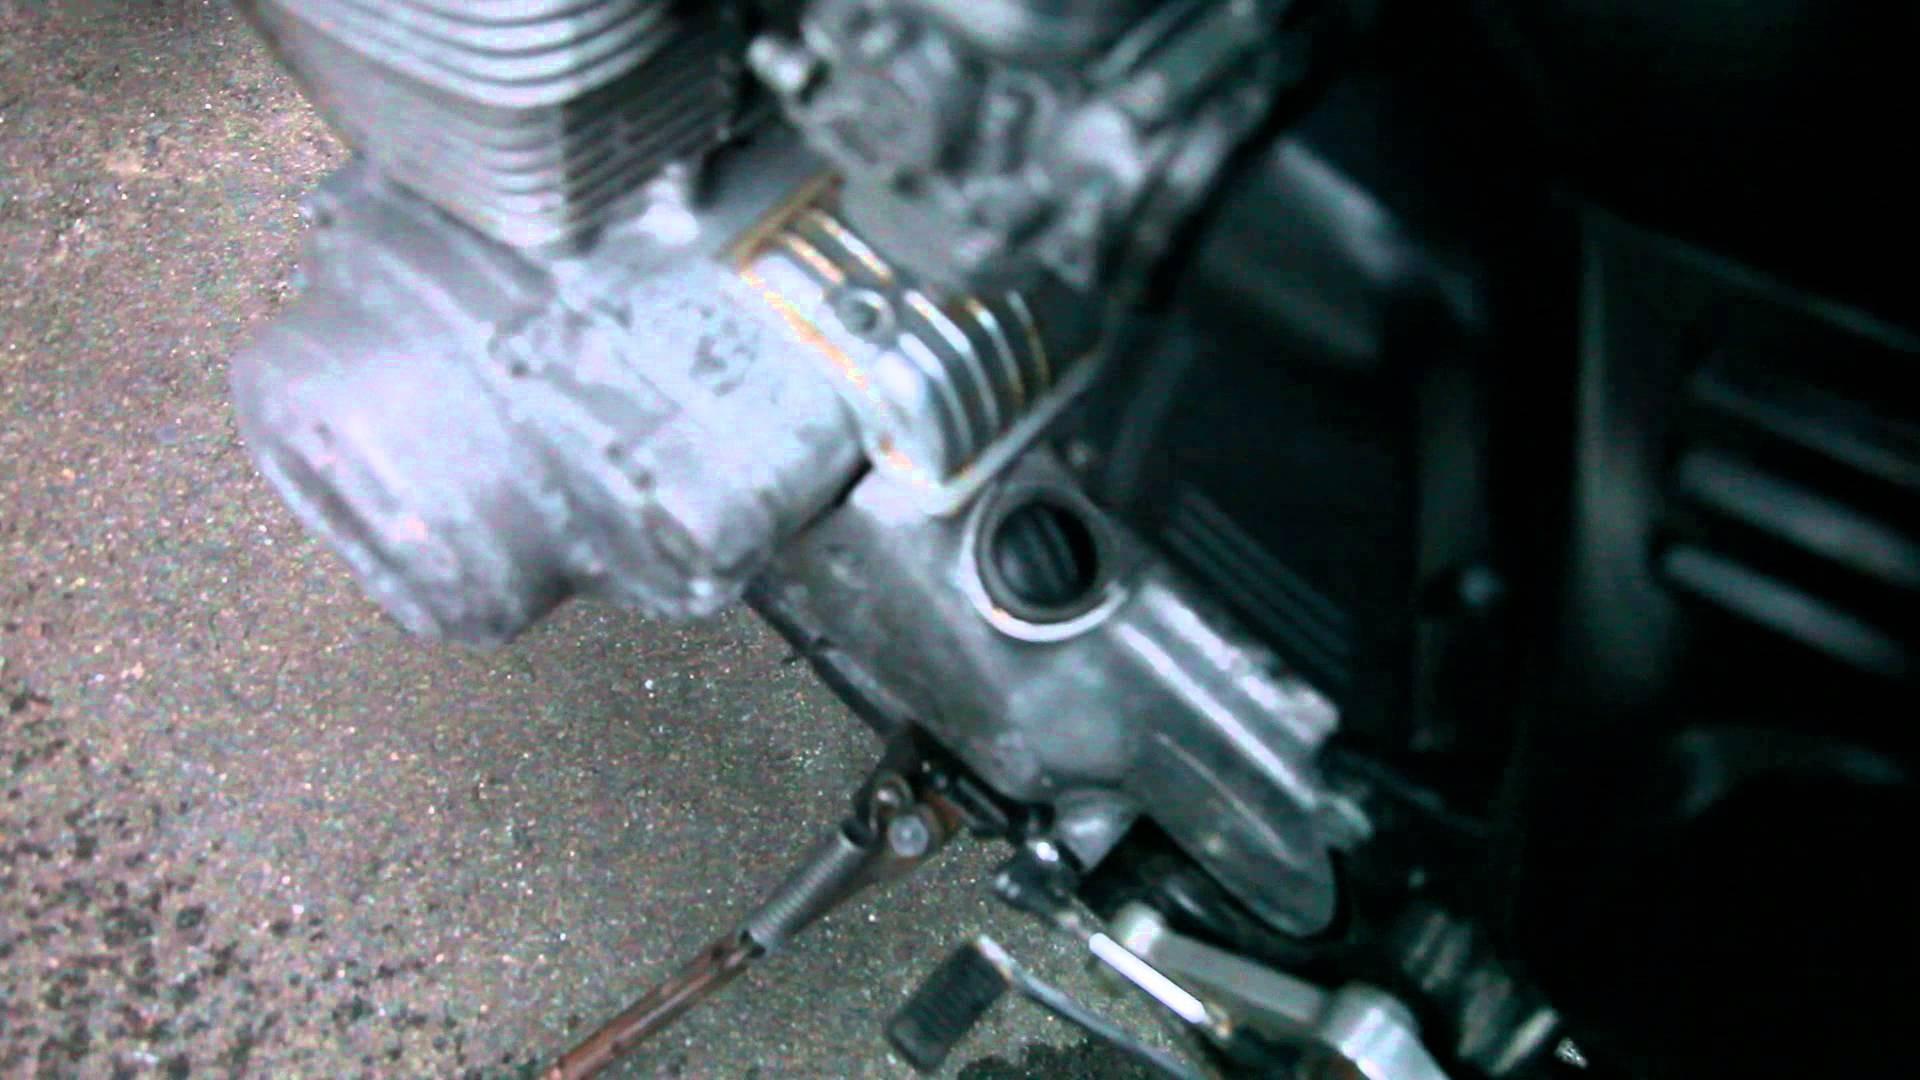 Honda Cb750 Engine Diagram Honda Cb750 Starter Problem Of Honda Cb750 Engine Diagram